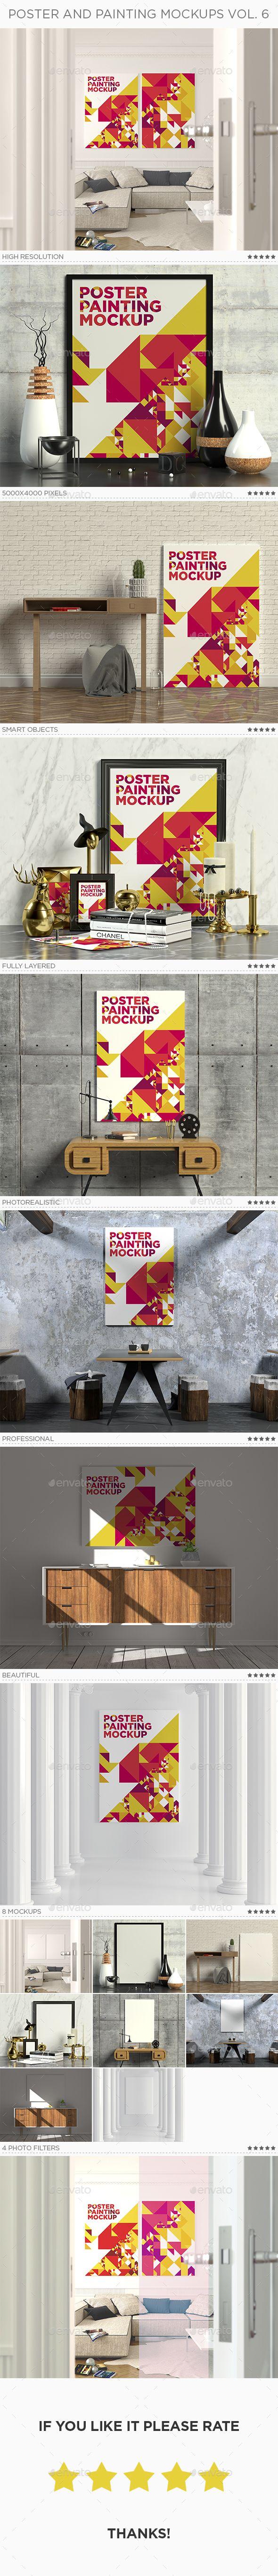 6 poster design photo mockups - Poster Painting Mockup Vol 6